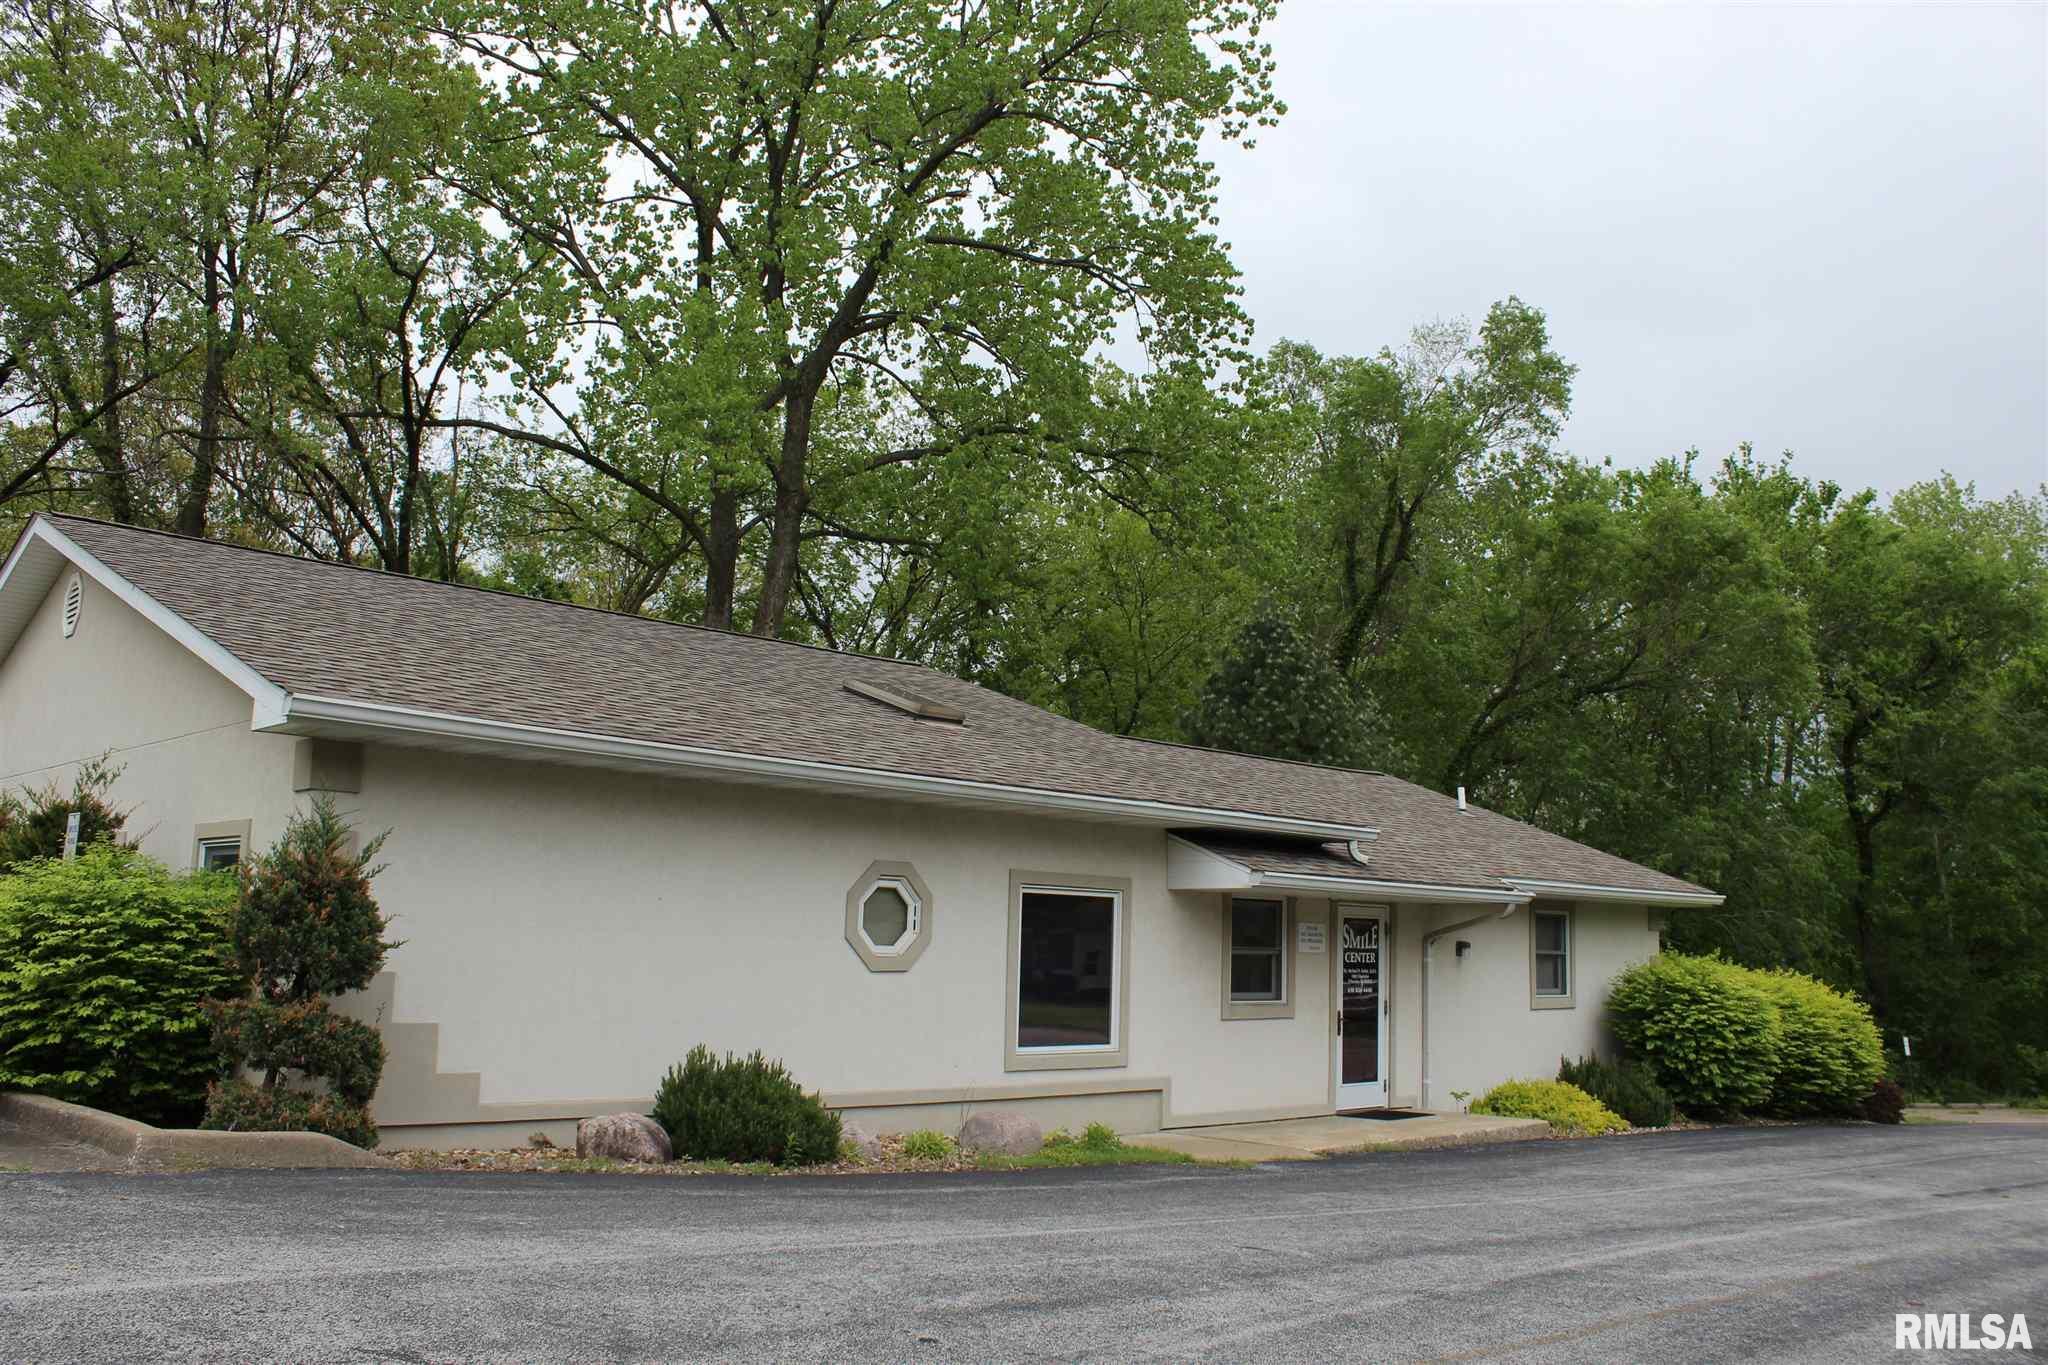 1101 Opdyke Street Property Image